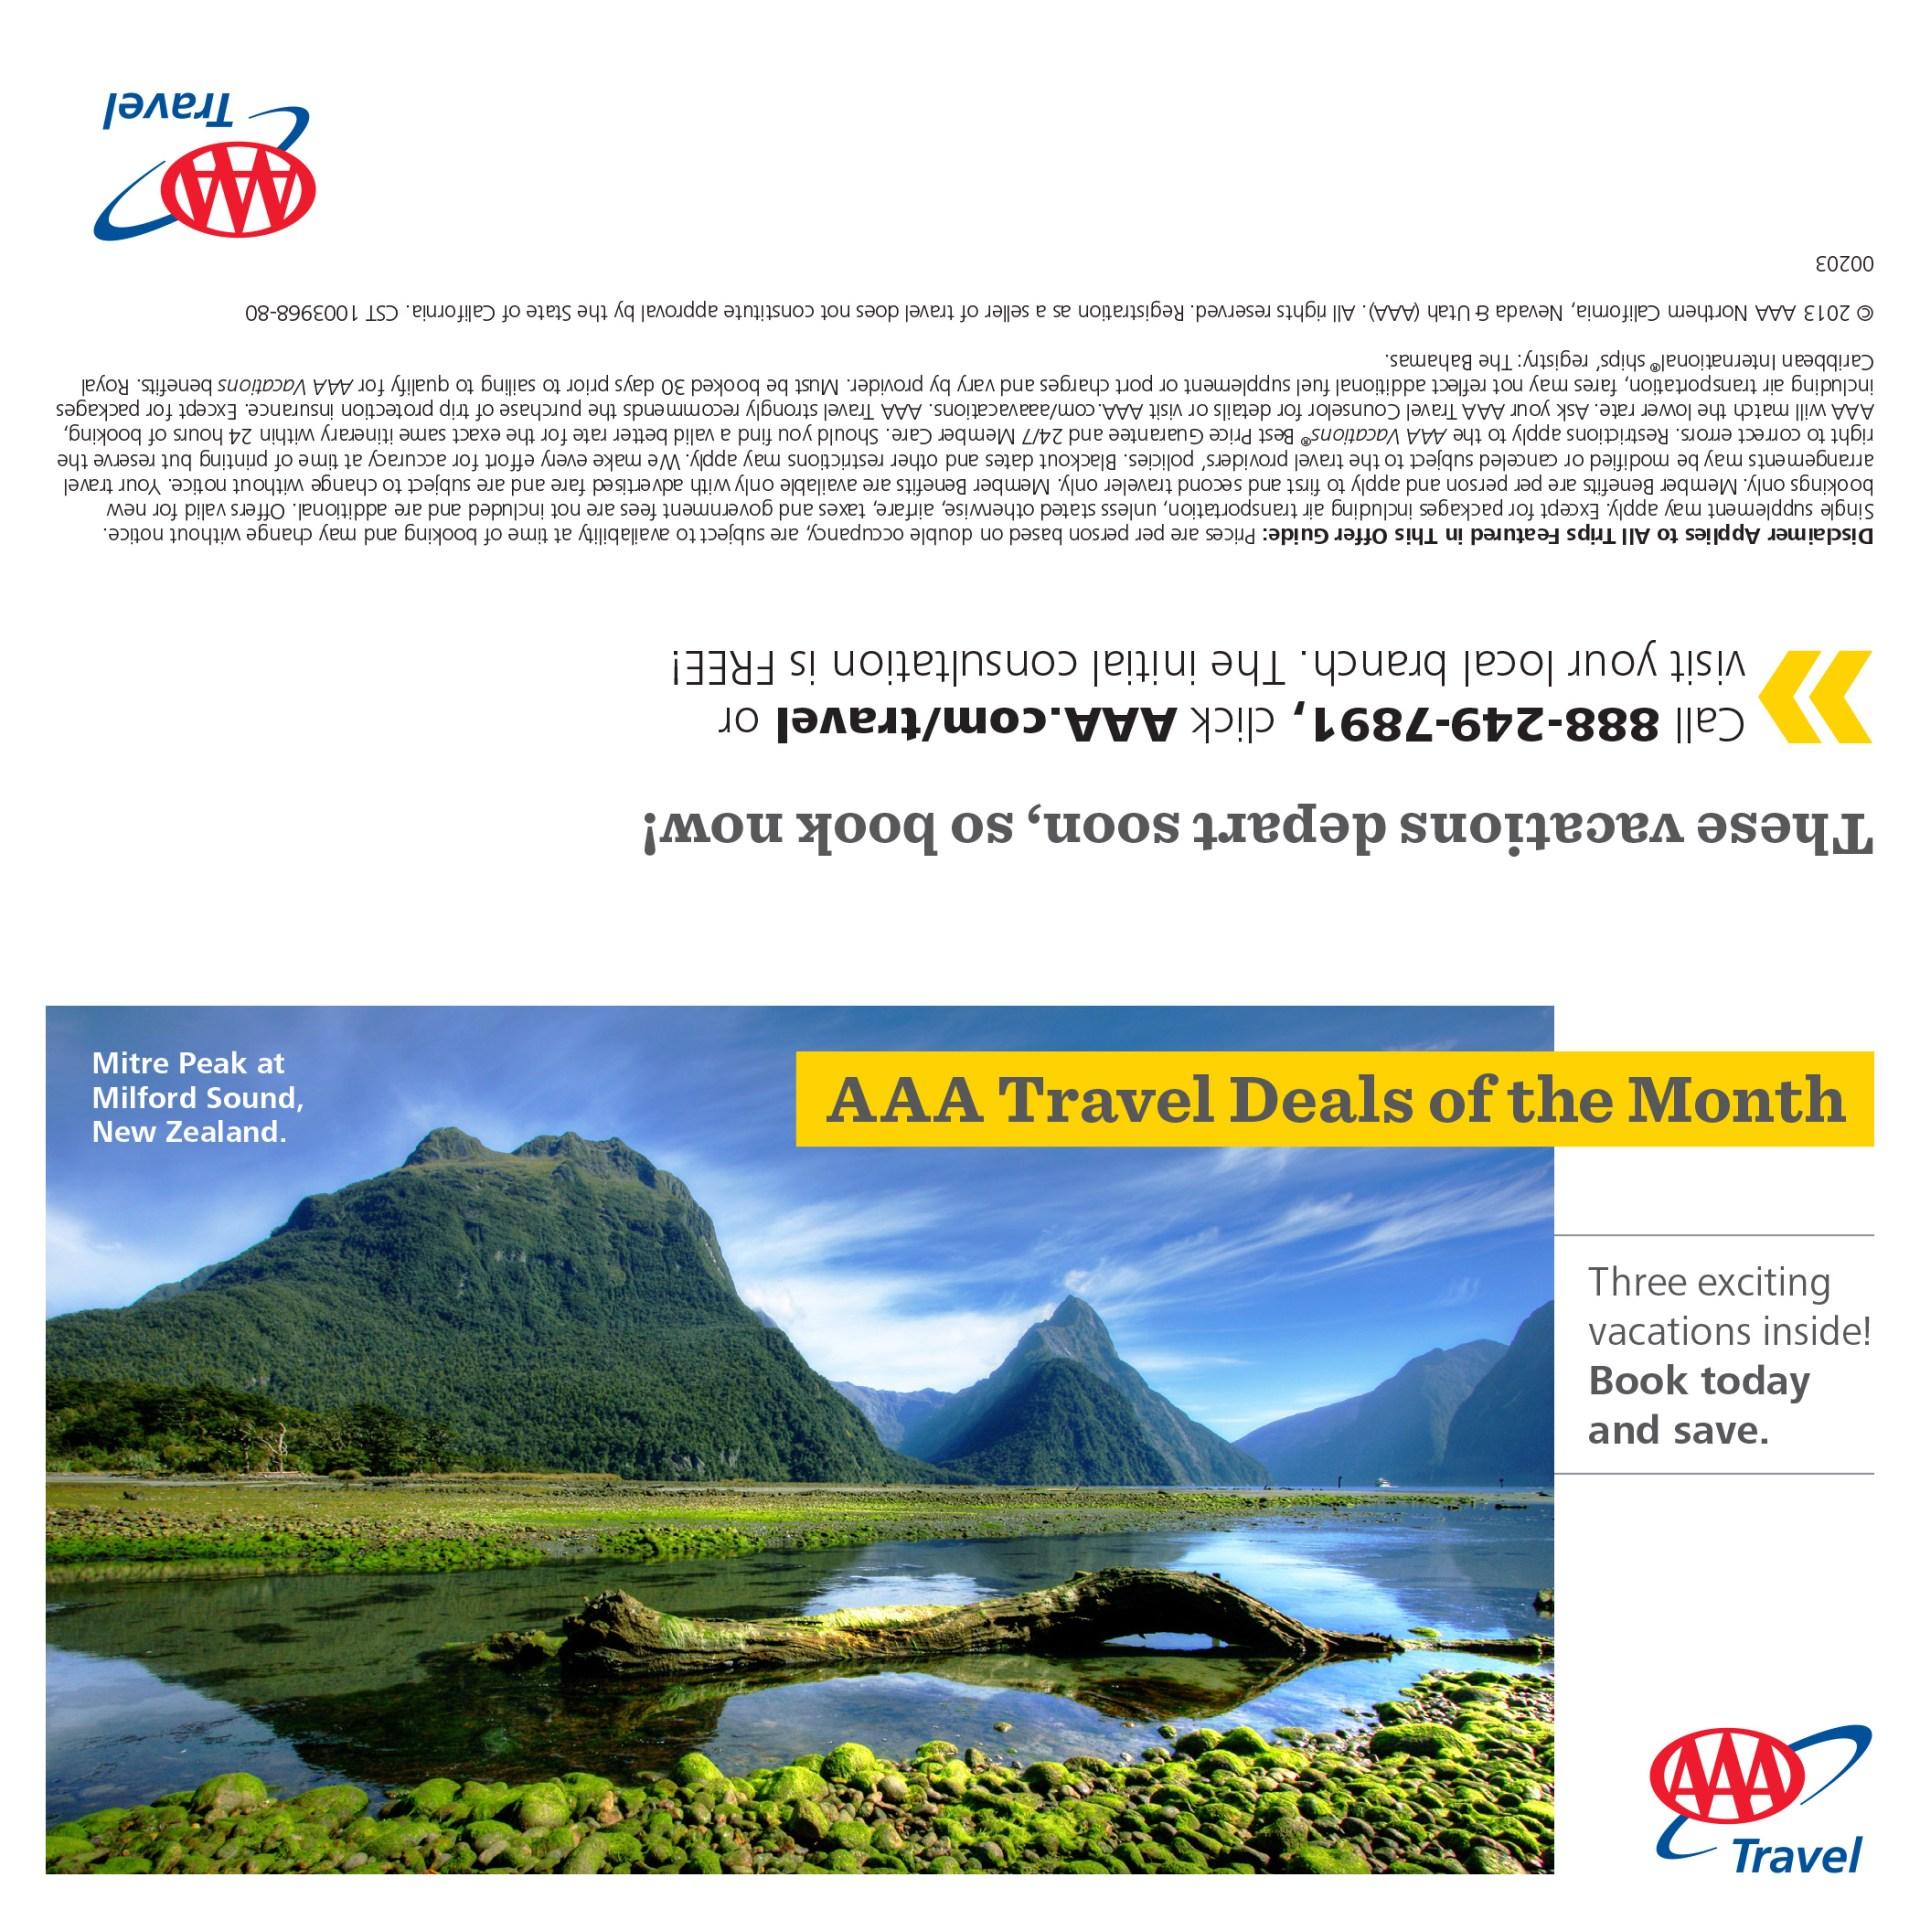 January 2012 AAA bill insert (front)